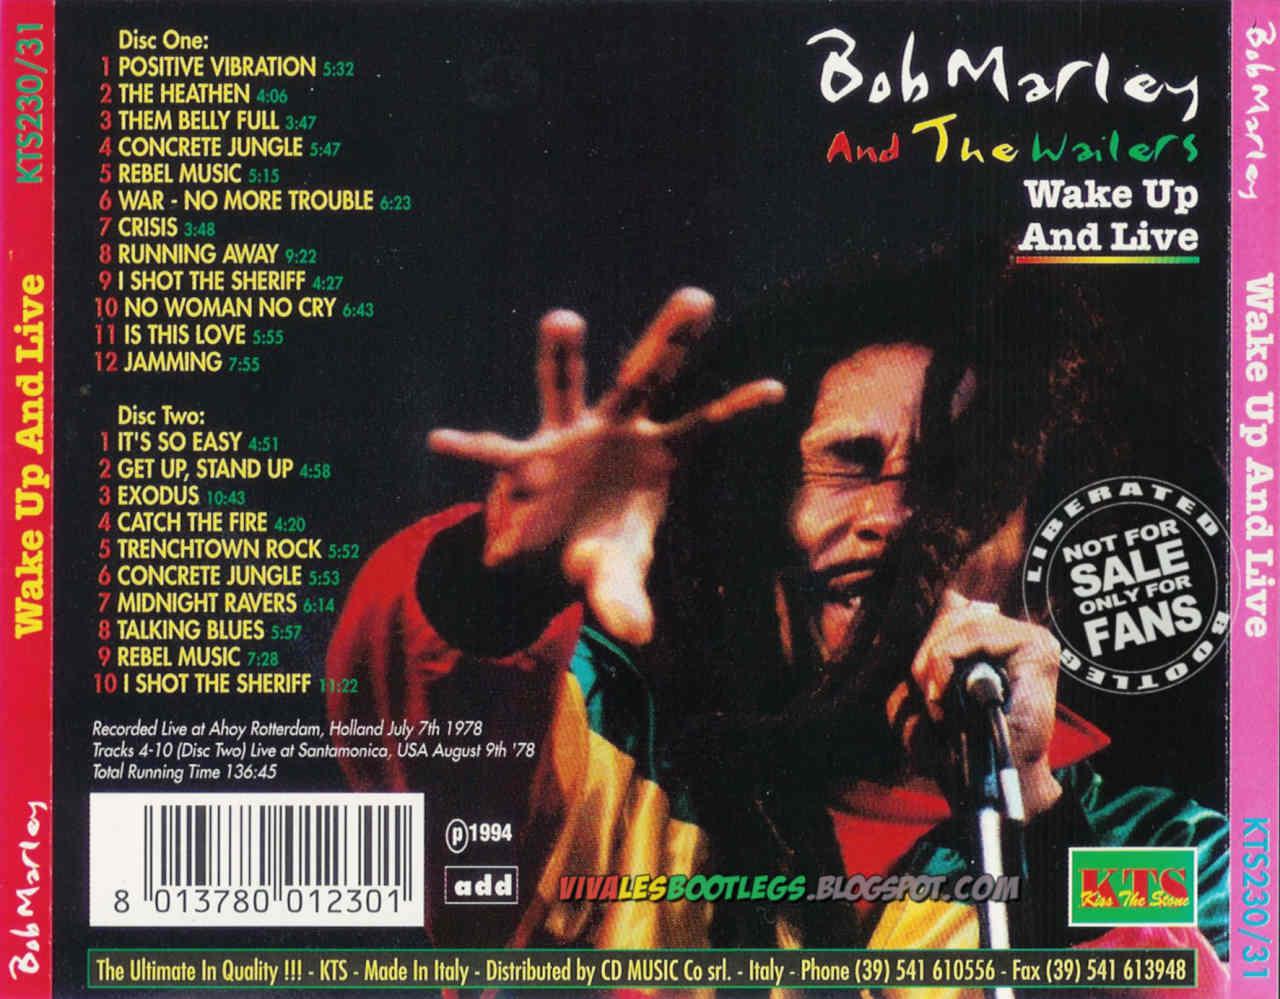 Bob Marley & The Wailers: Wake Up And Live. Ahoy Hall, Rotterdam 1978 + Santa Monica, CA 1975. (Double CD :: Kiss The Stone :: MP3 @320 kbps & FLAC)